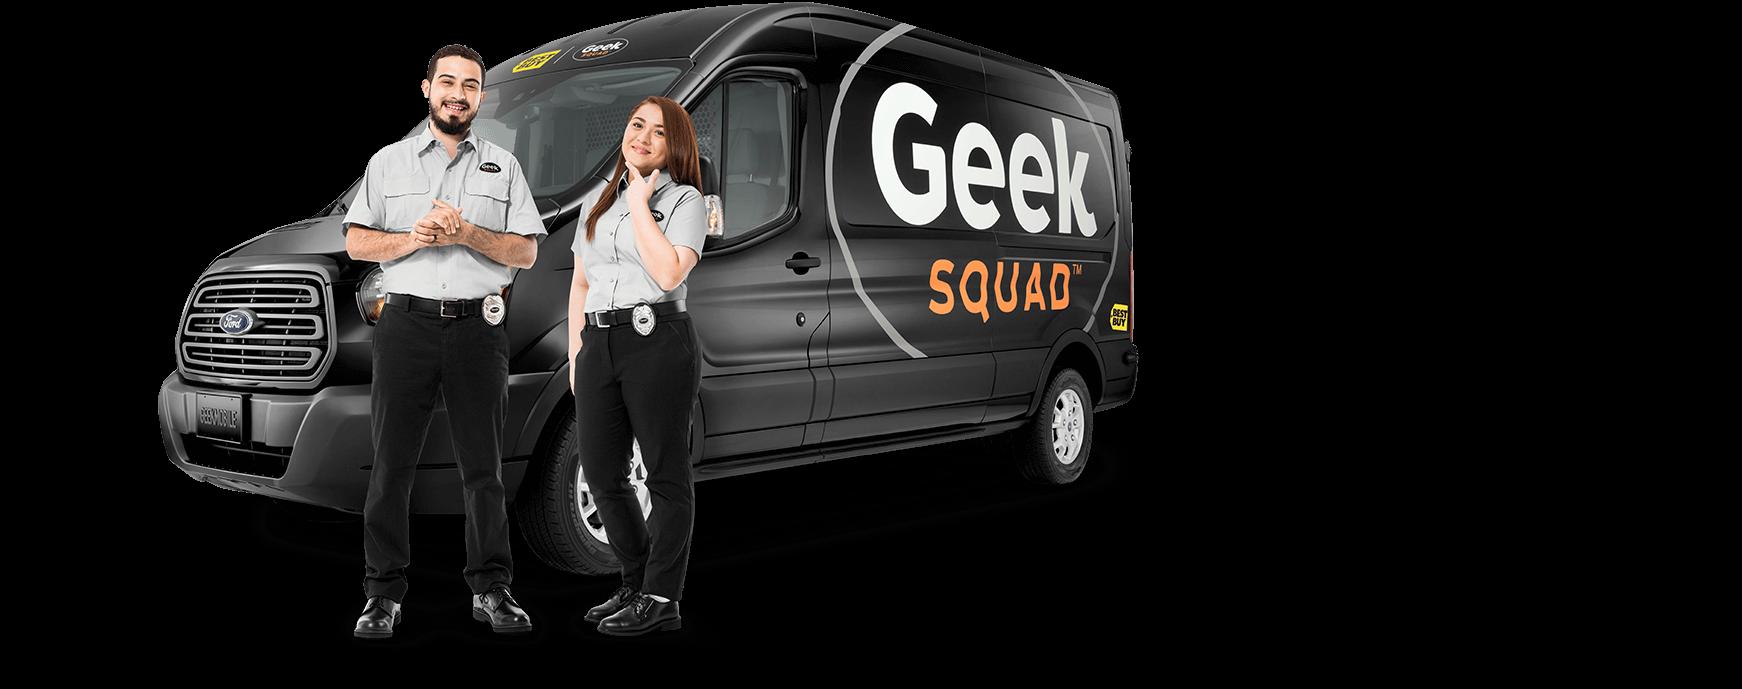 Geek Squad Agents and van